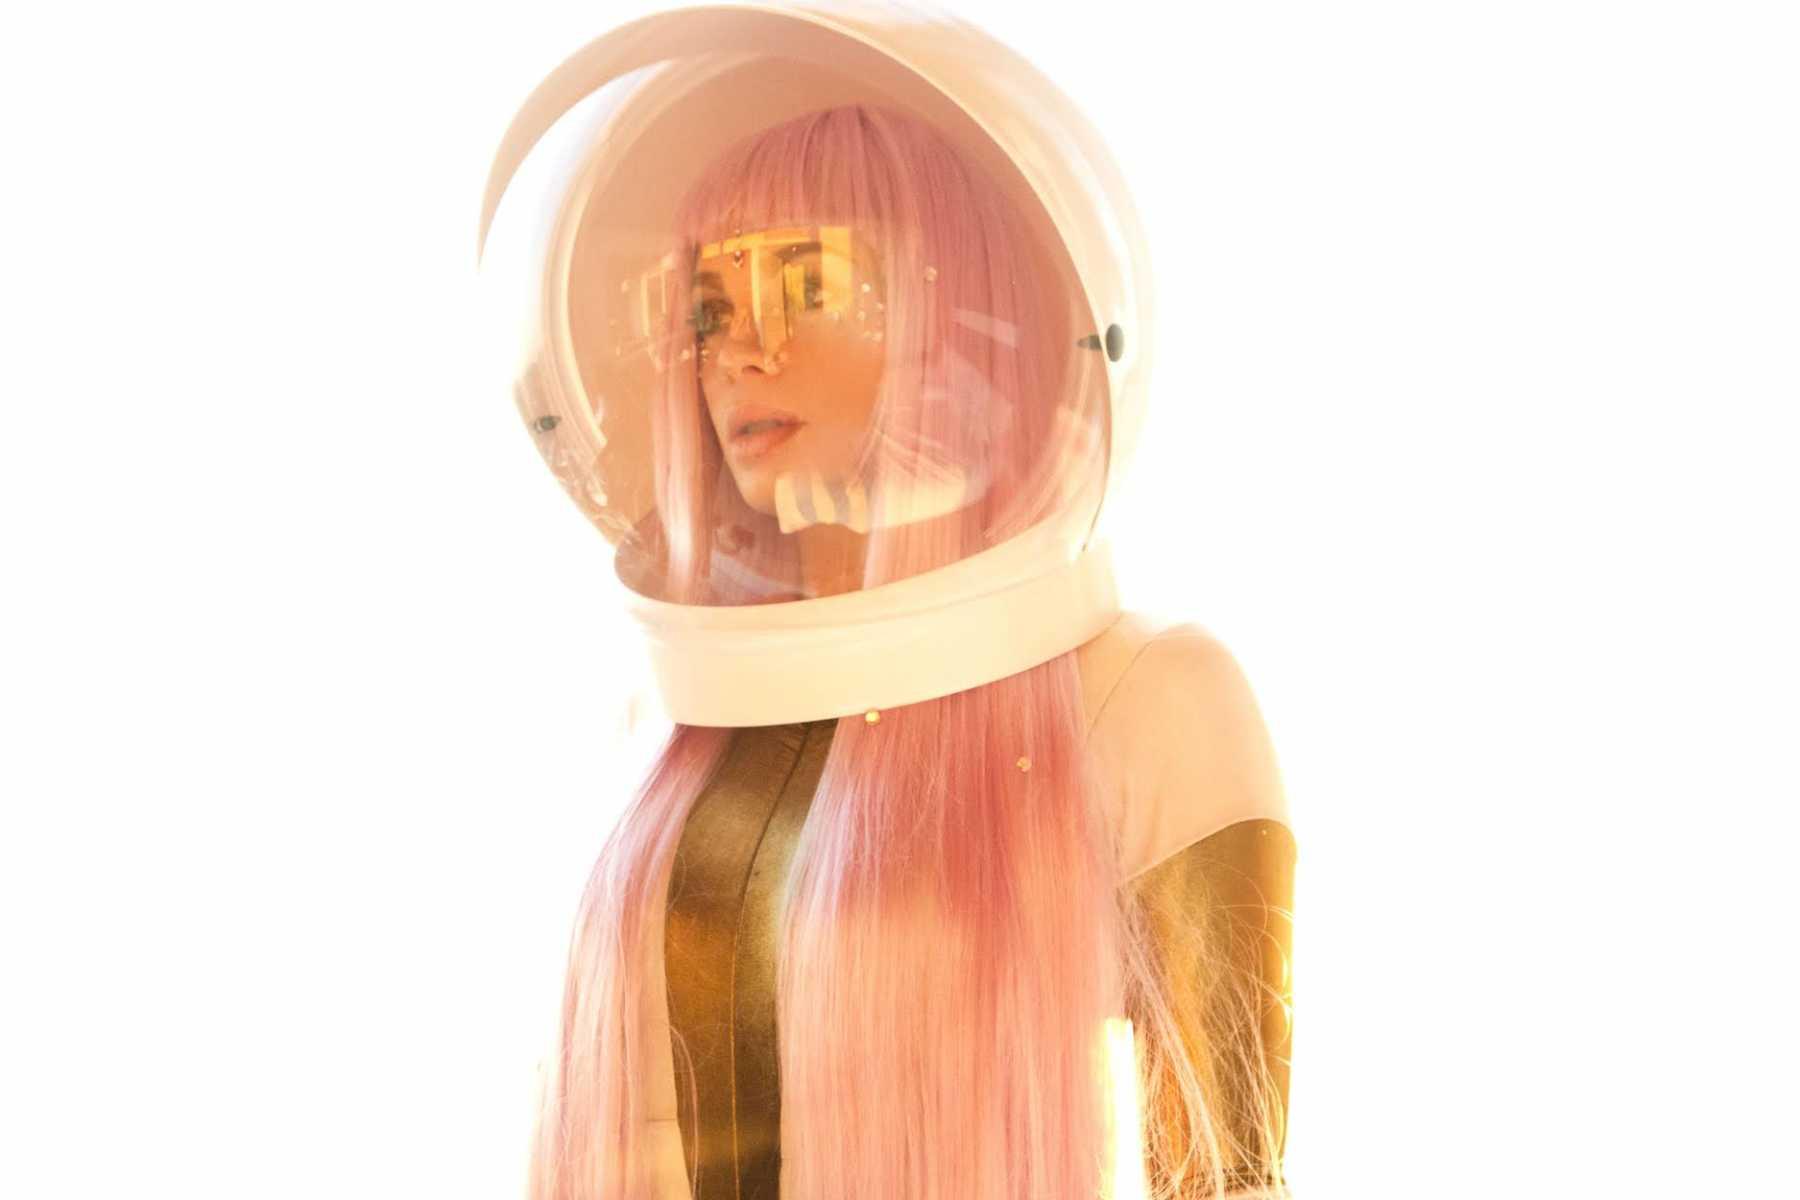 Exclusive: Eriel Indigo Prepares For Take Off With Her Elevate EP, Talks Recording, Vision, And More | Eriel Indigo